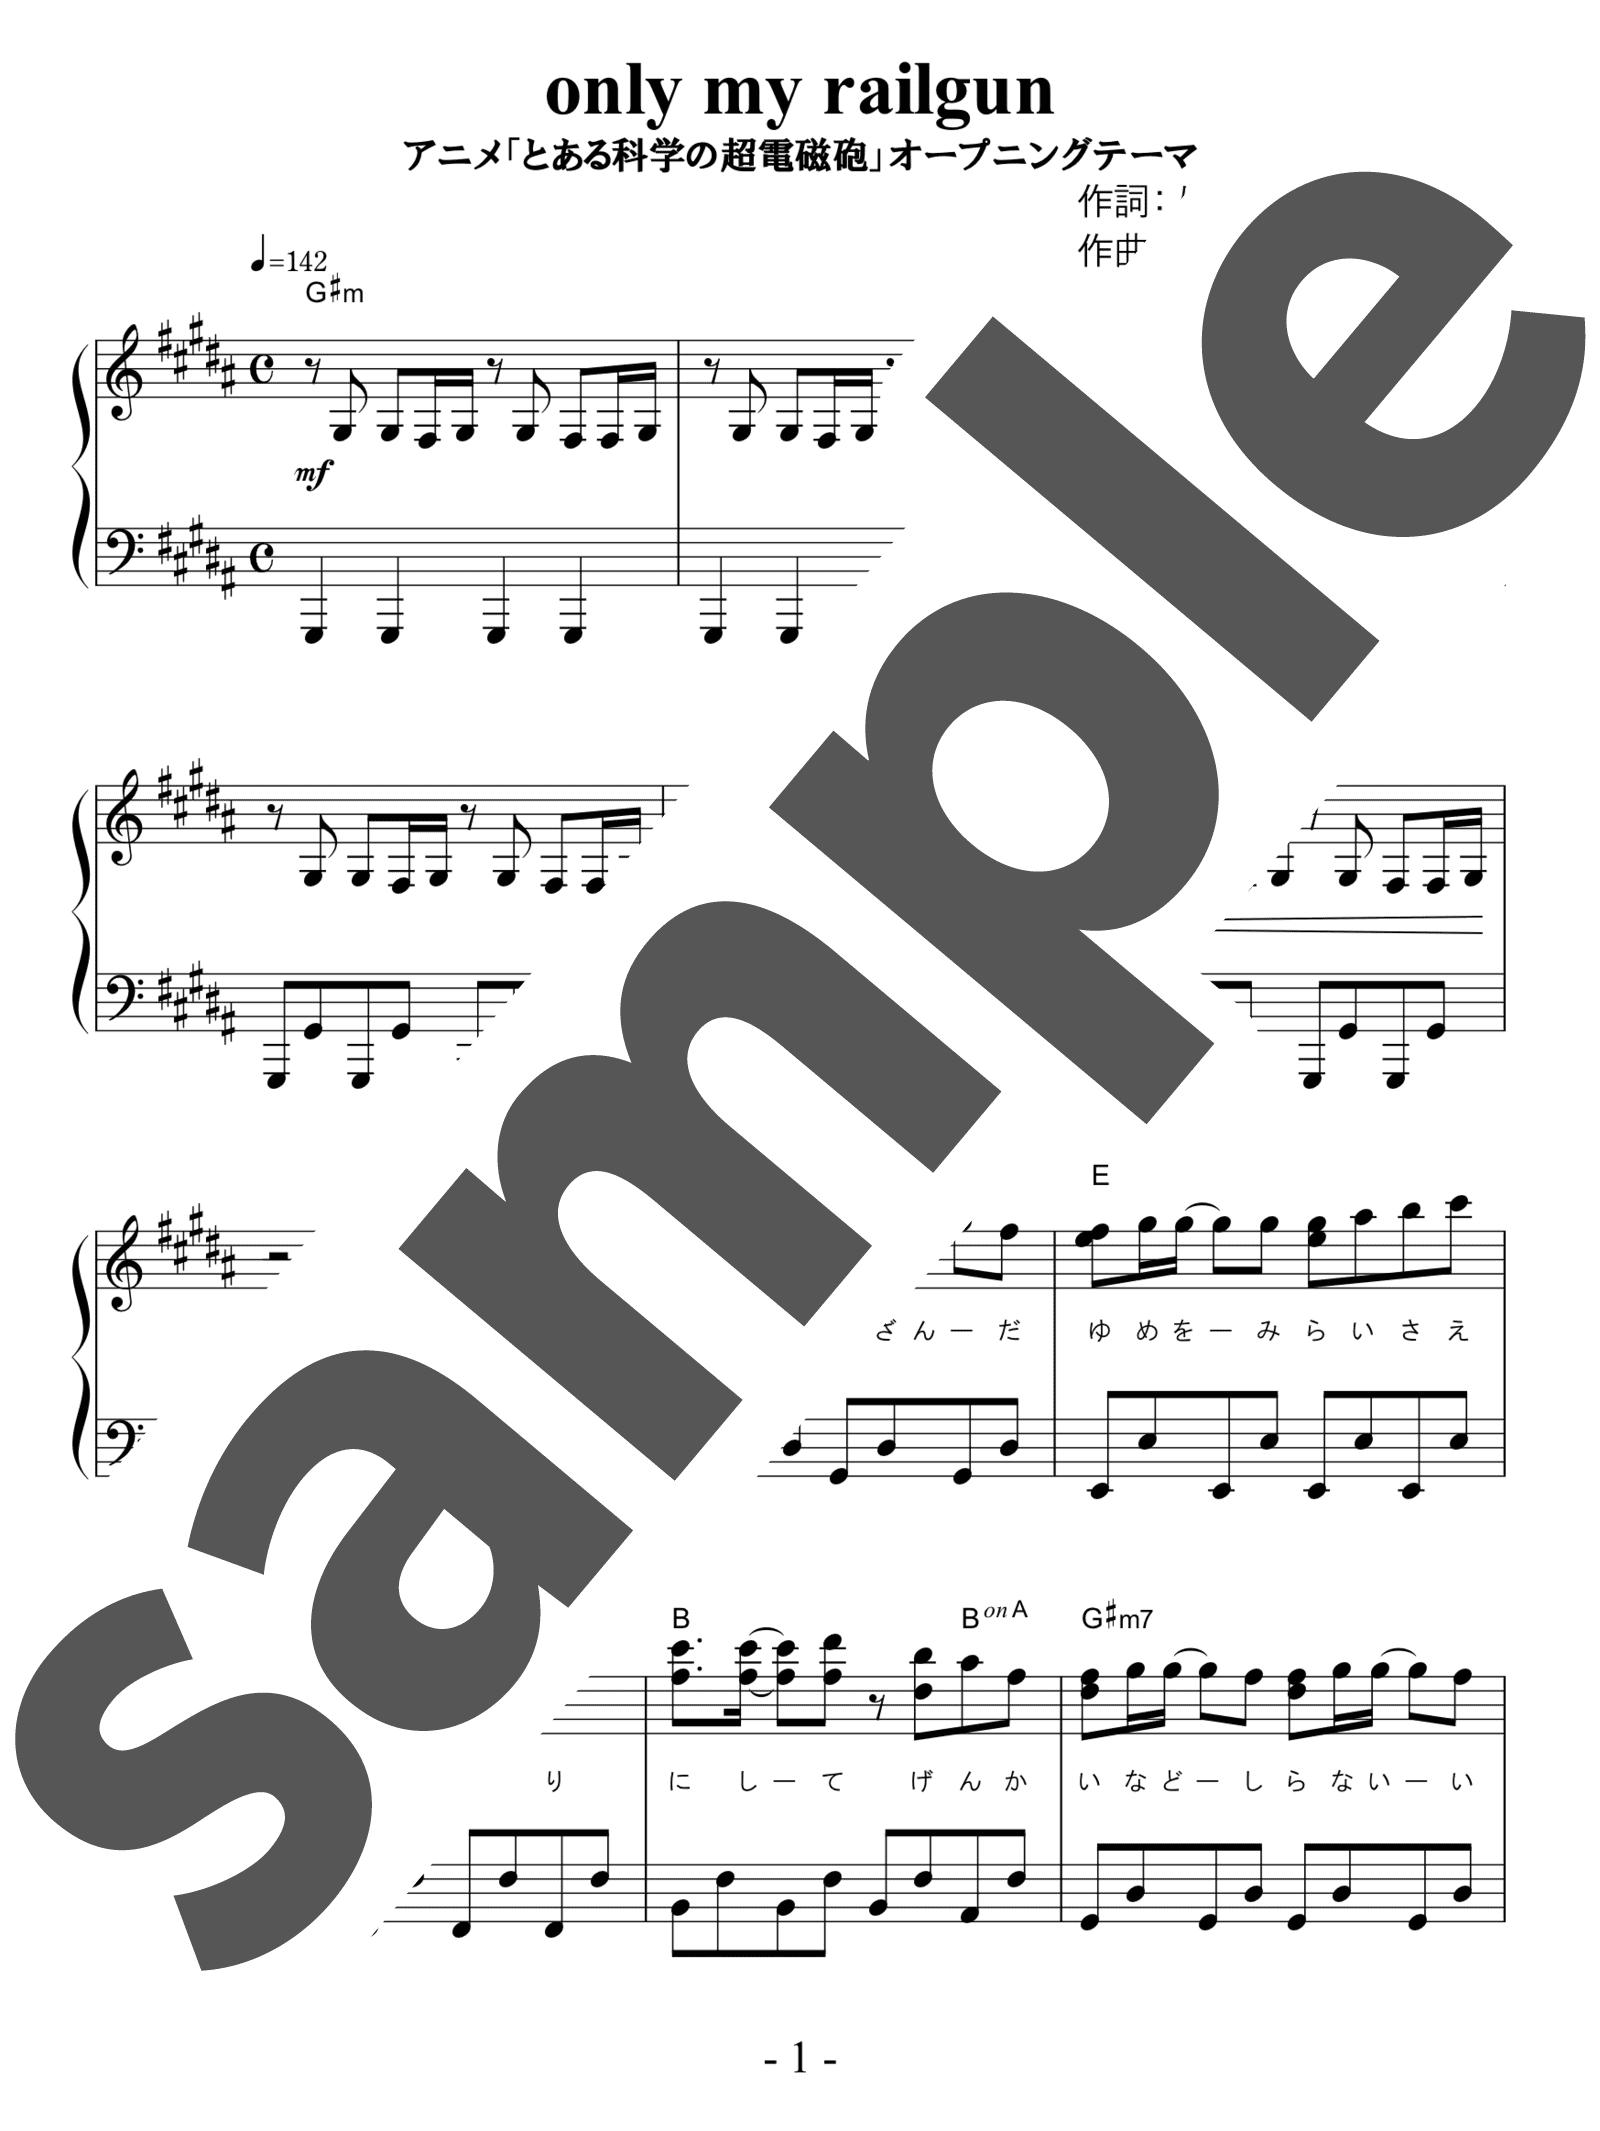 「only my railgun」のサンプル楽譜